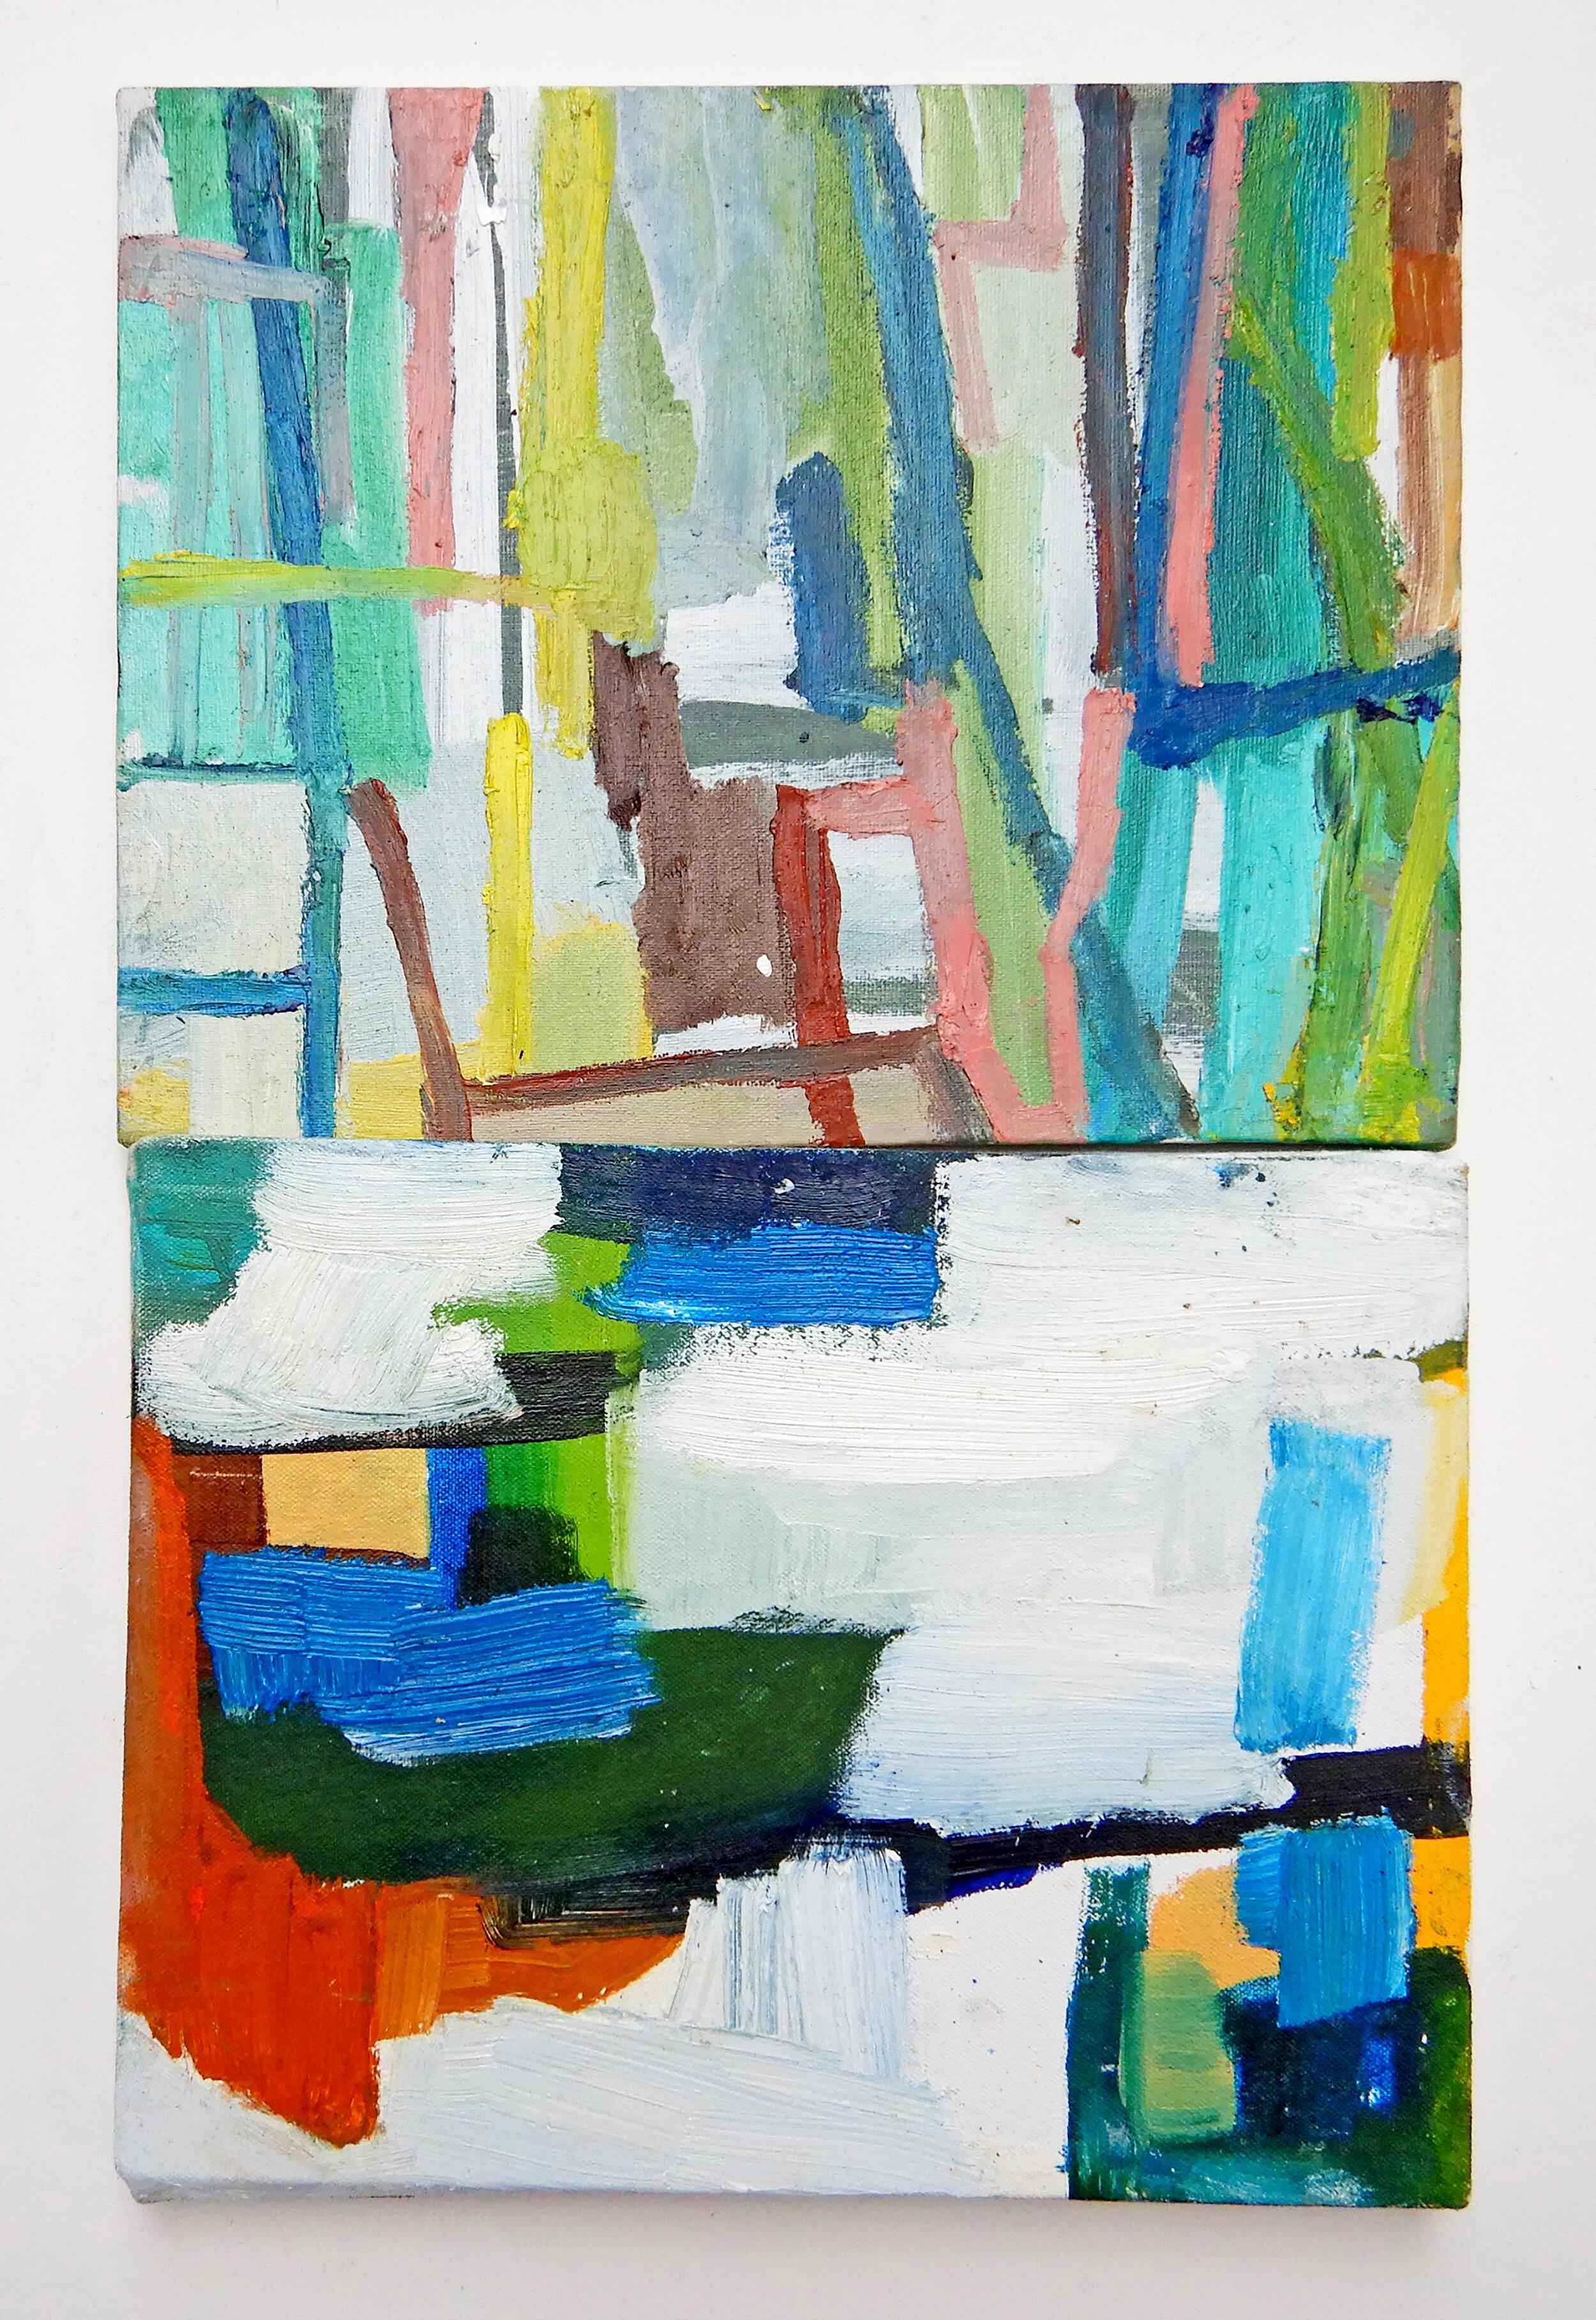 small painting oil on canvas on wood #12.jpg